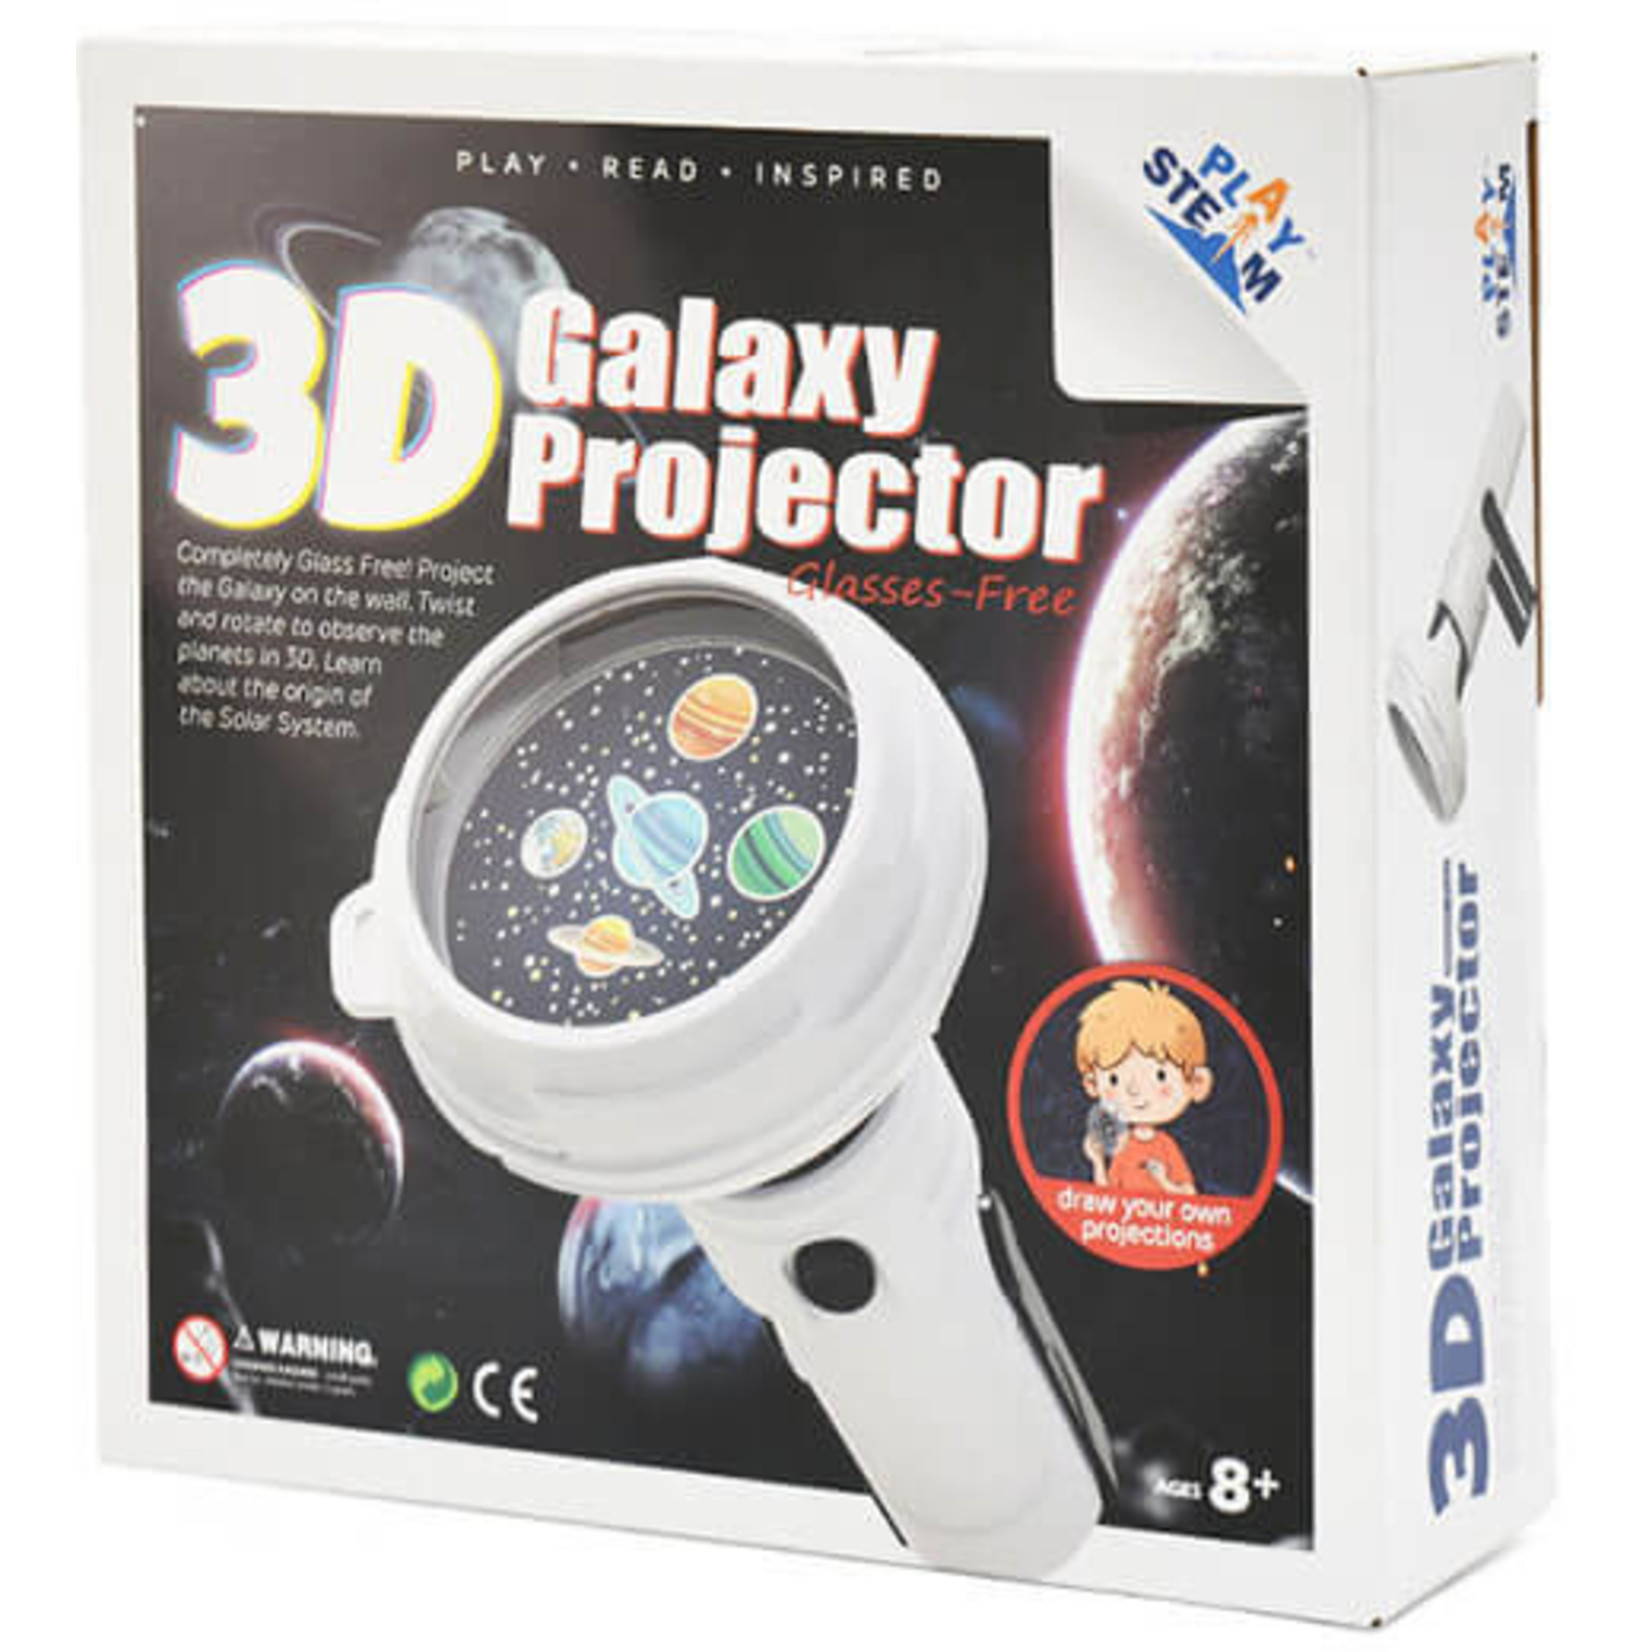 PLAY STEAM 3D GALAXY PROJECTOR